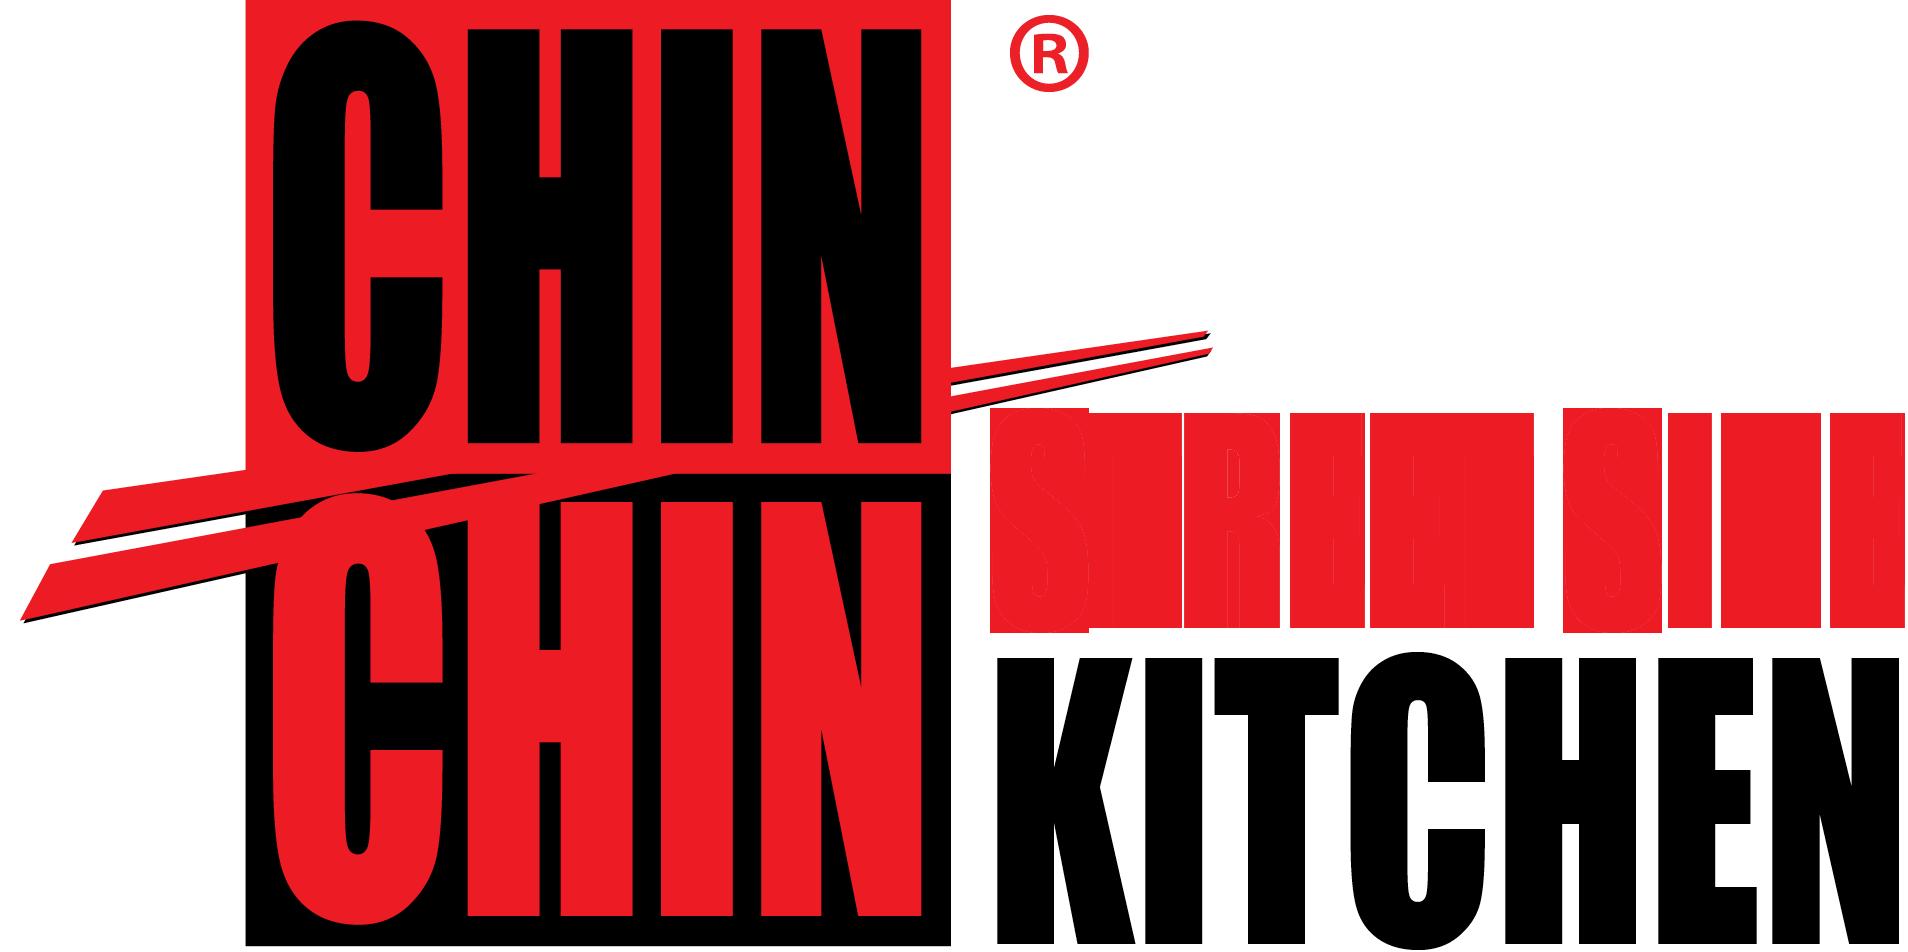 Chin Chin Street Side Logo.png